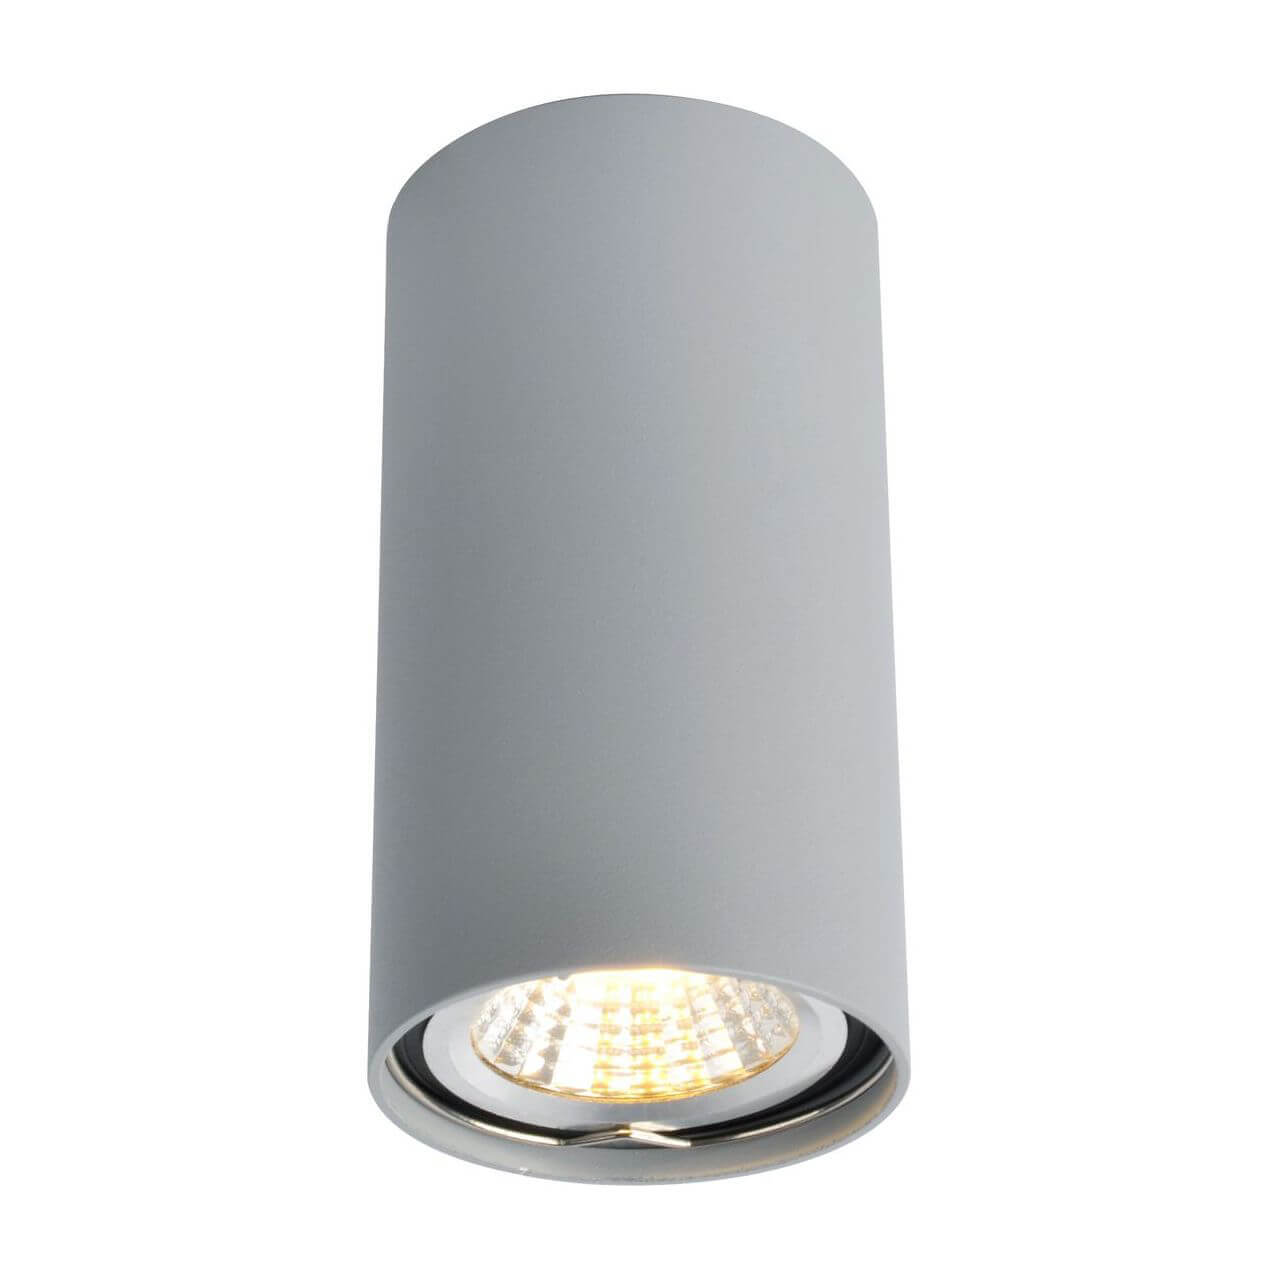 Светильник Arte Lamp A1516PL-1GY 1516